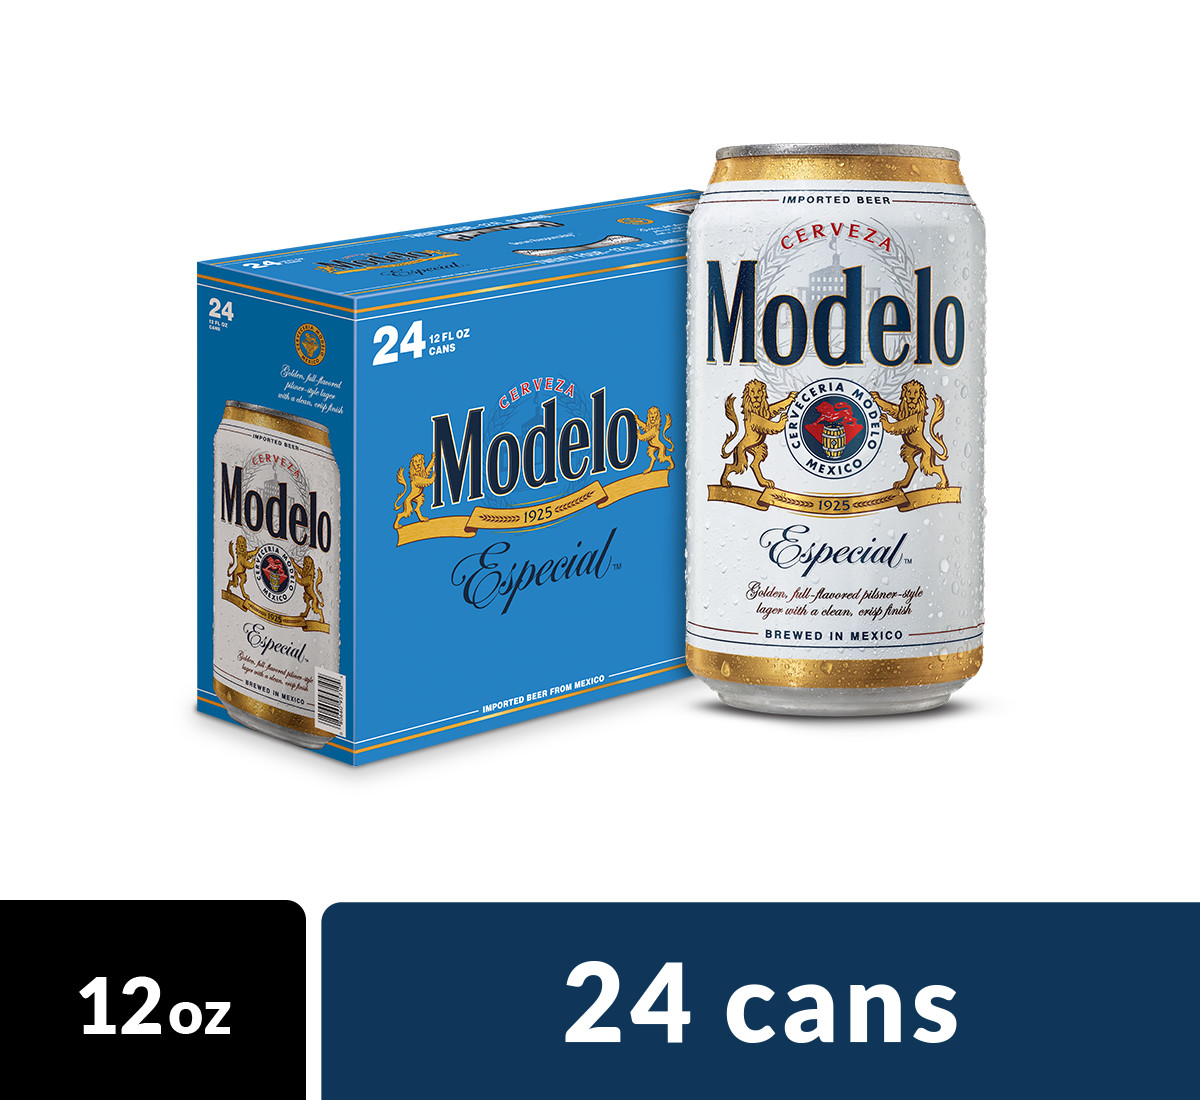 Modelo Especial Import Beer, 24 pk 12 fl oz Cans, 4.4% ABV